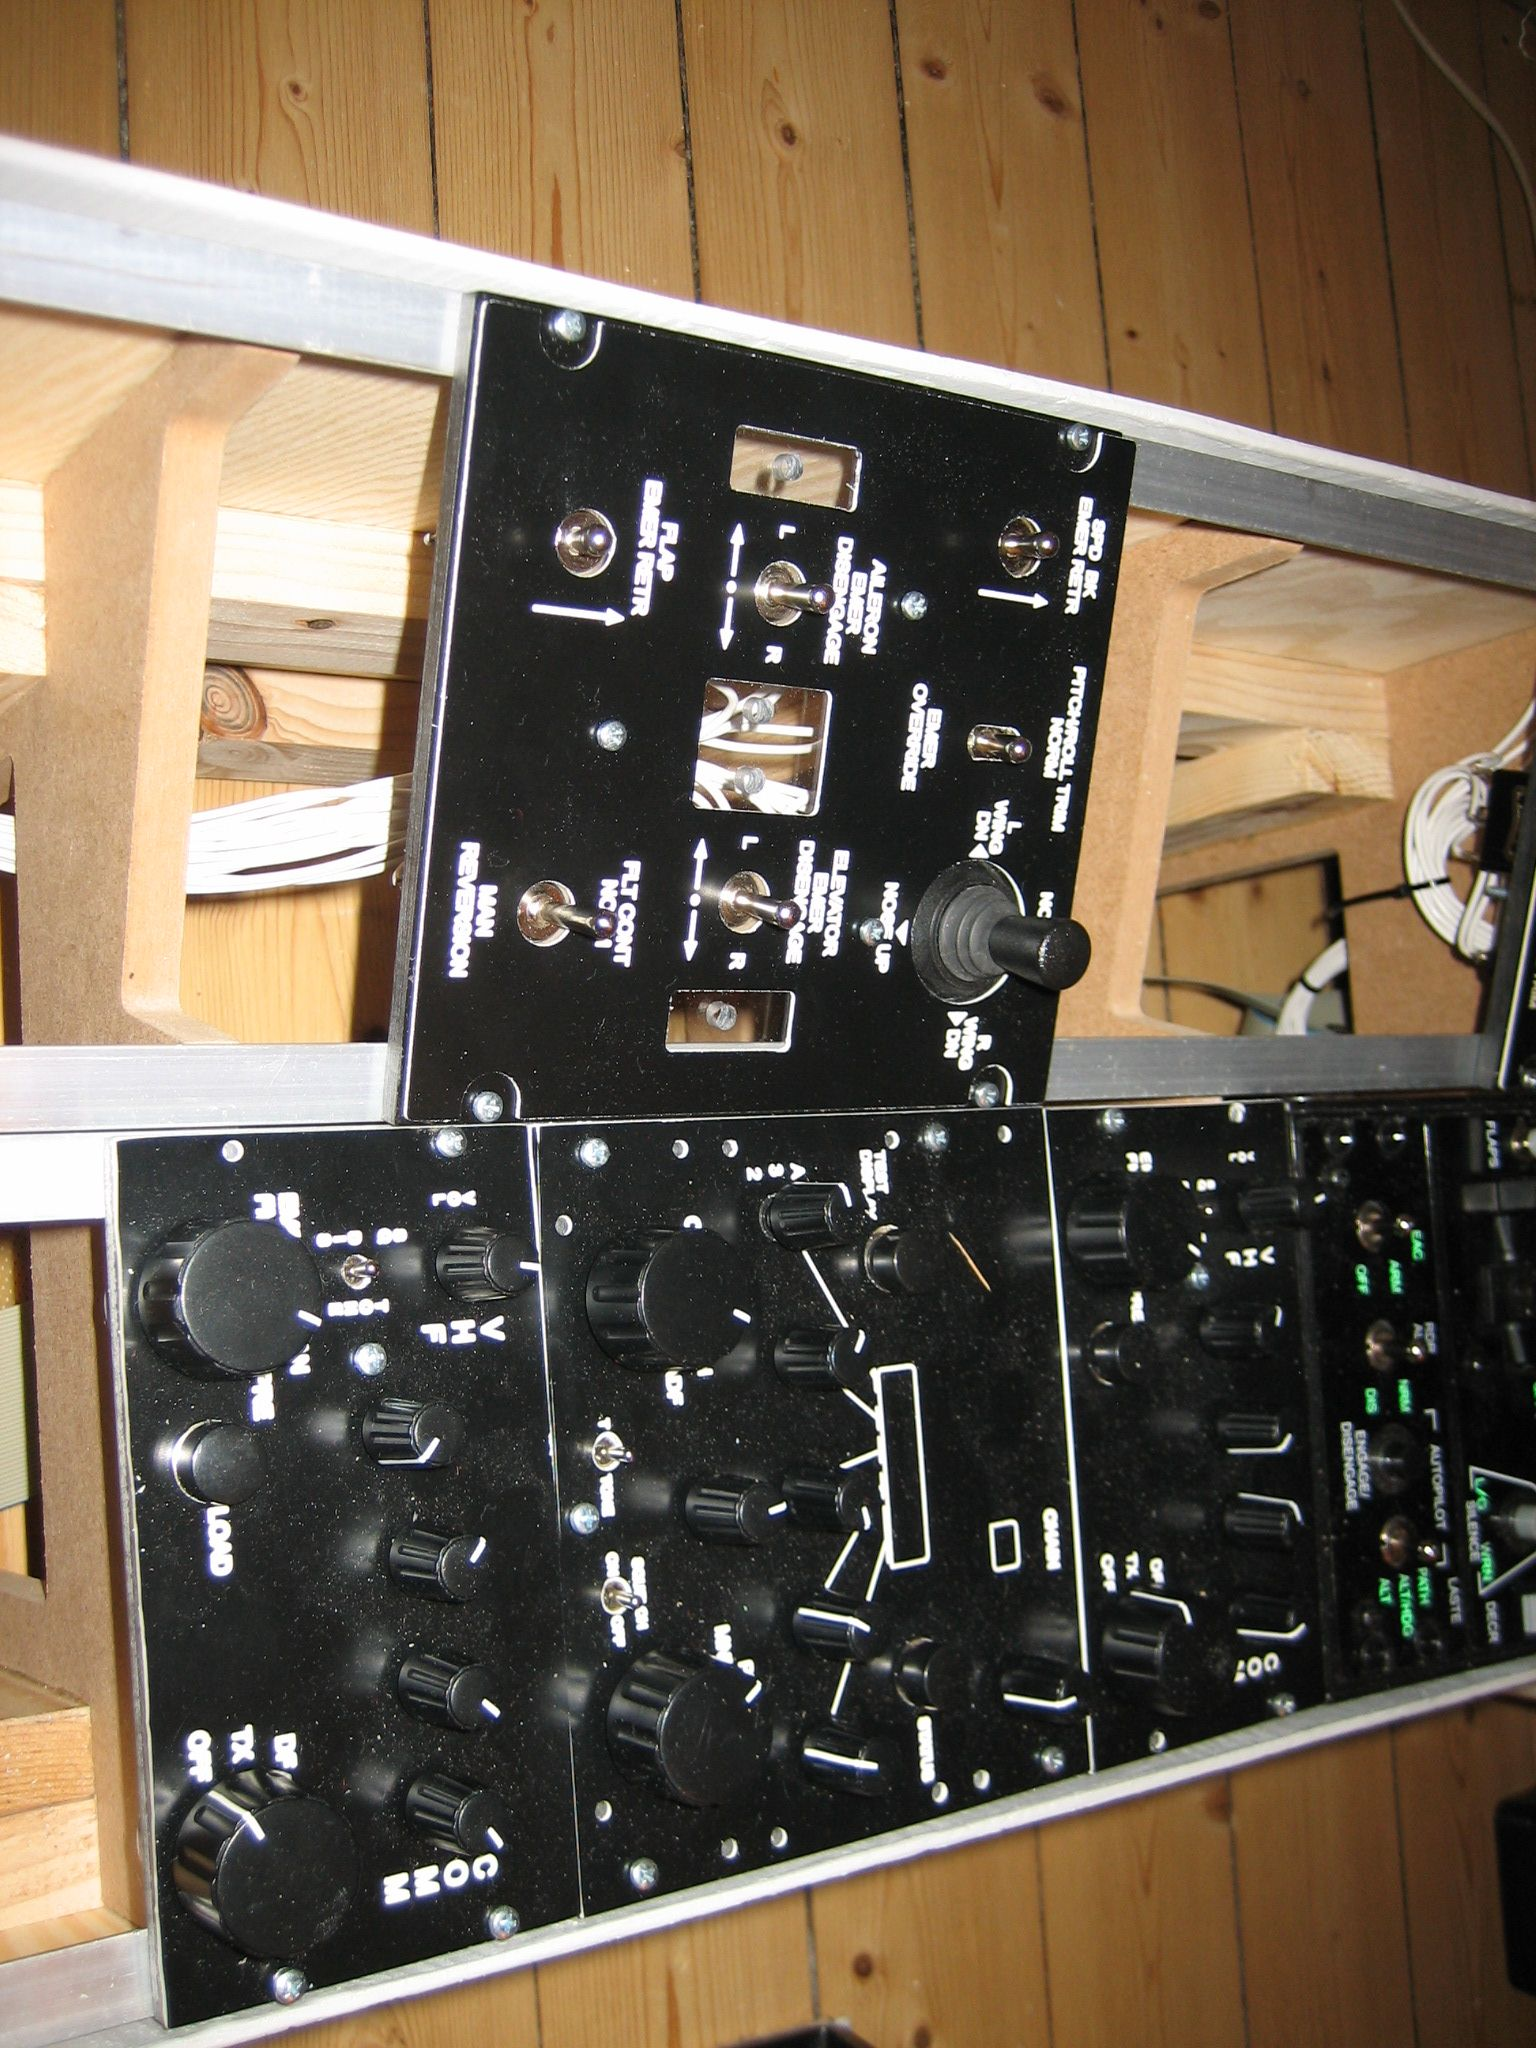 Pin by Doug Pierce on Cockpits in 2019   Flight simulator cockpit